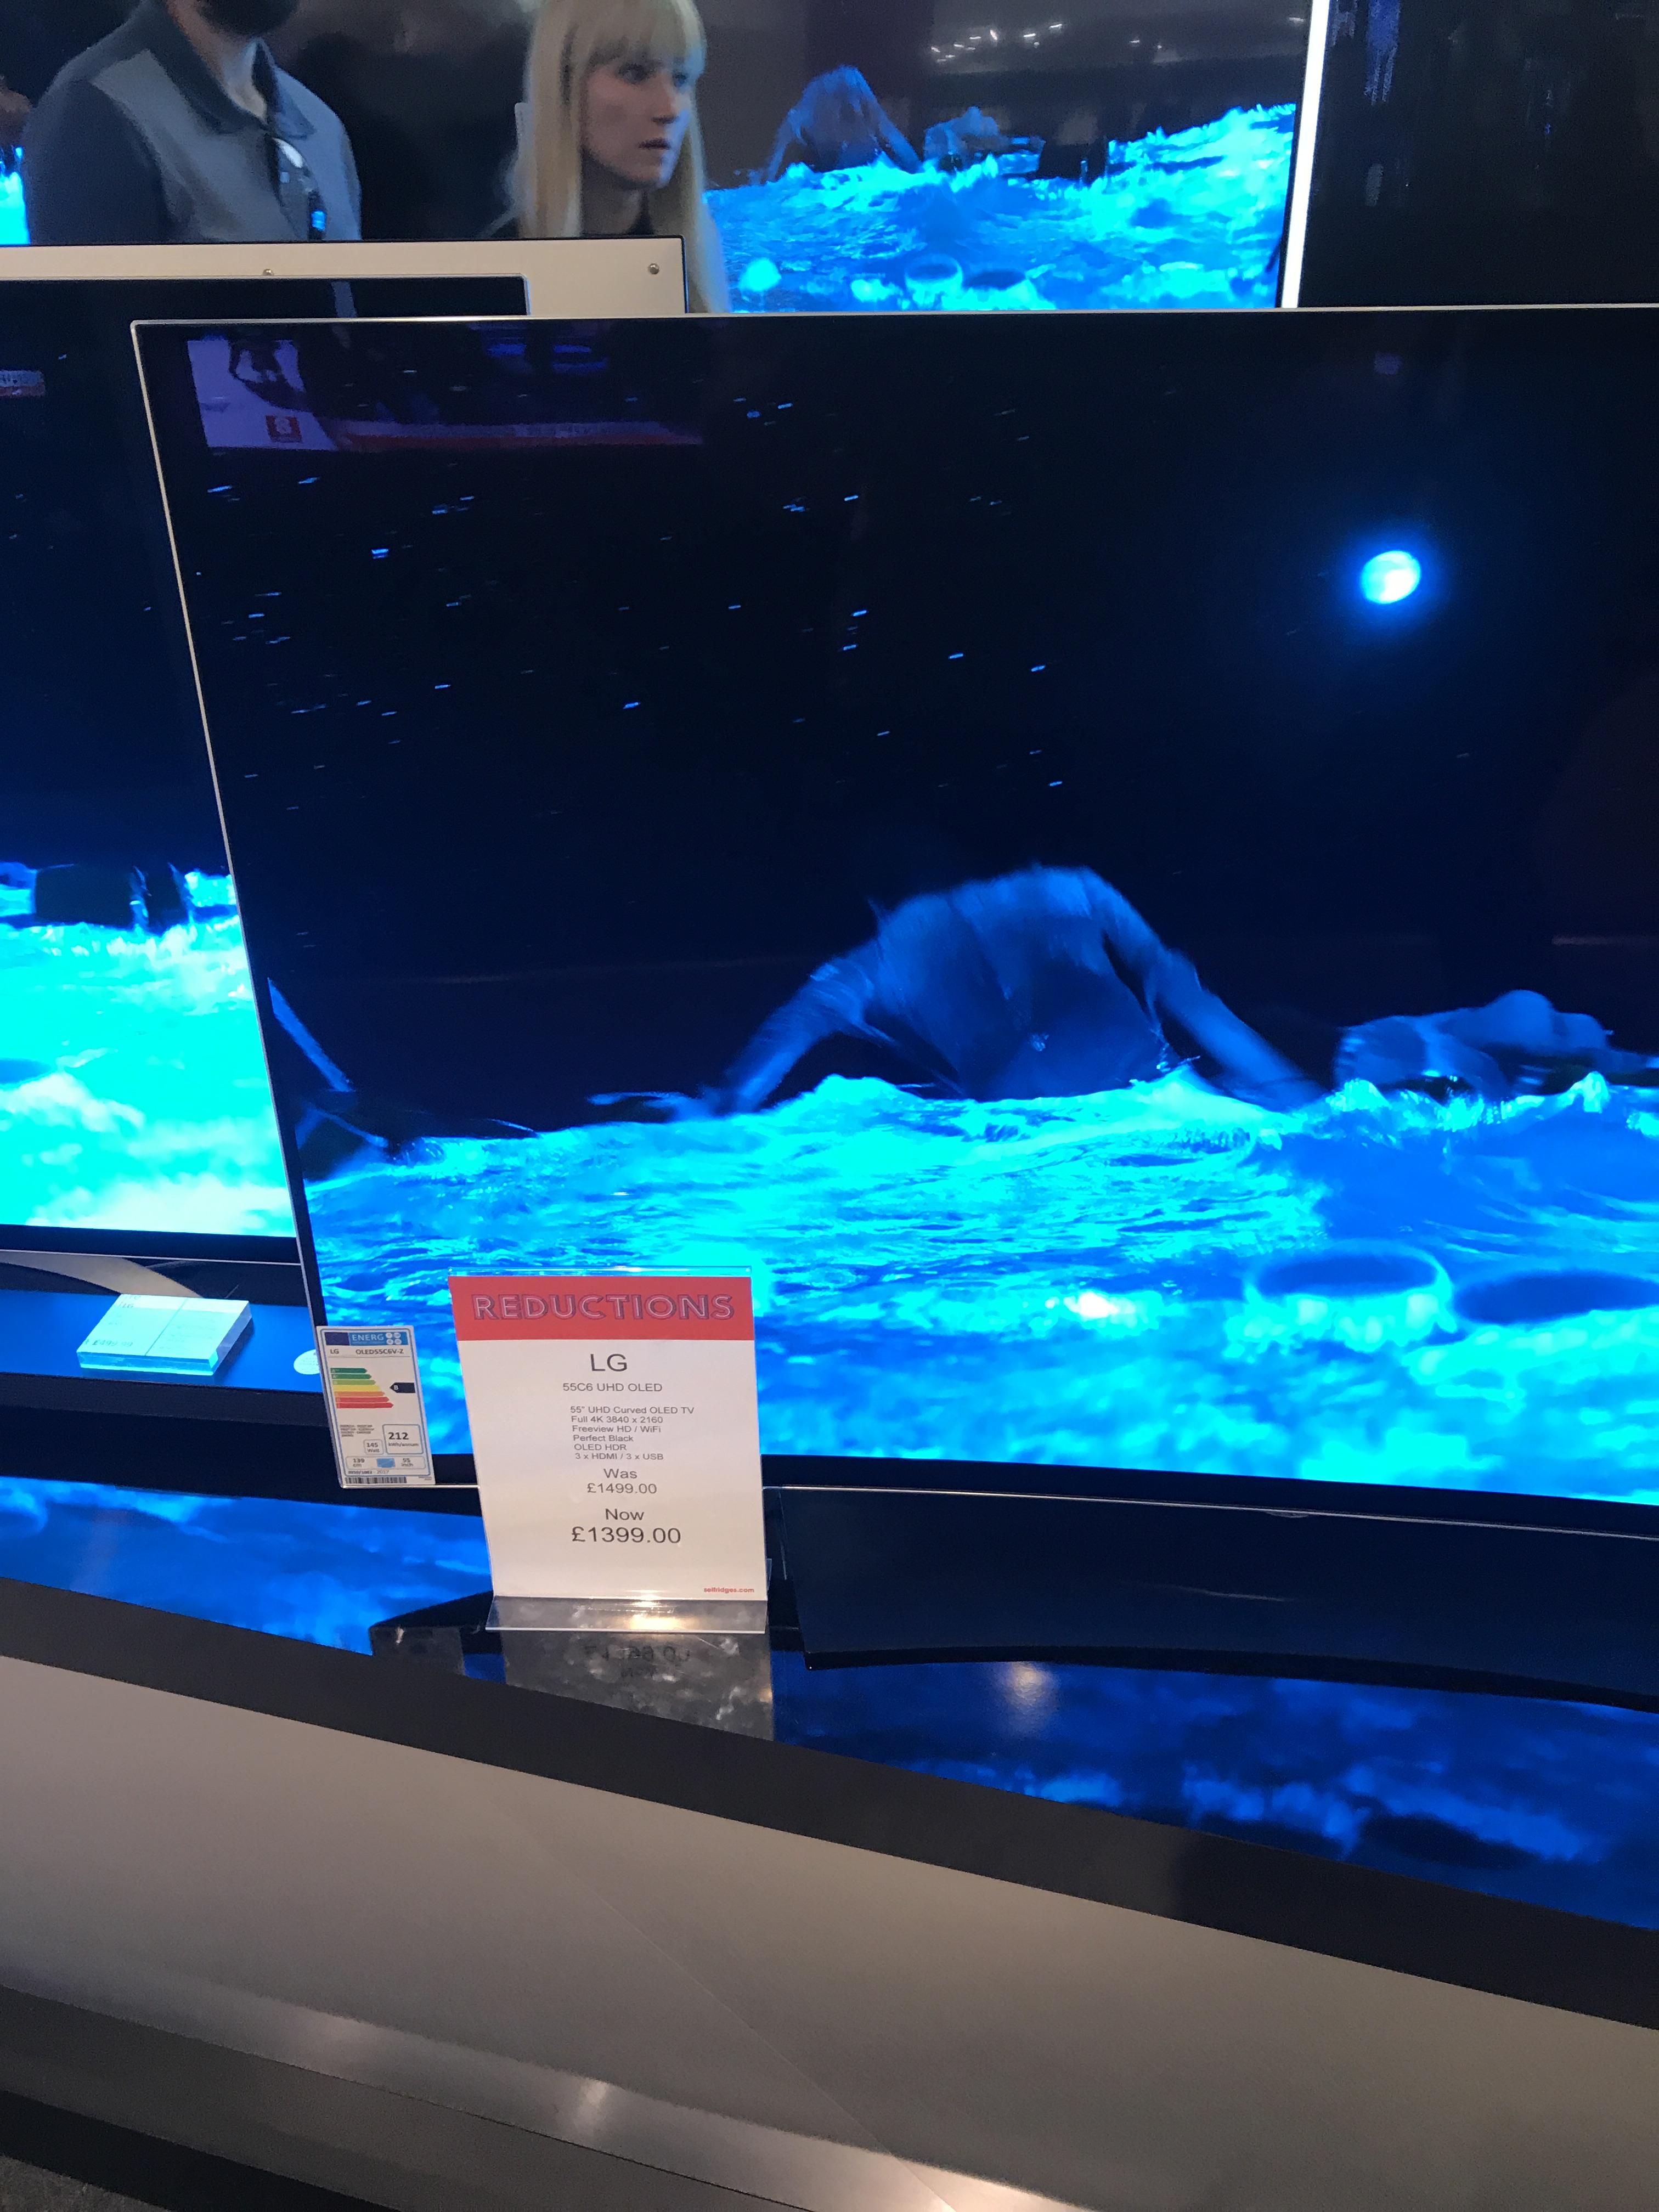 "55"" LG C6 OLED TV £1399 in Selfridges Trafford"